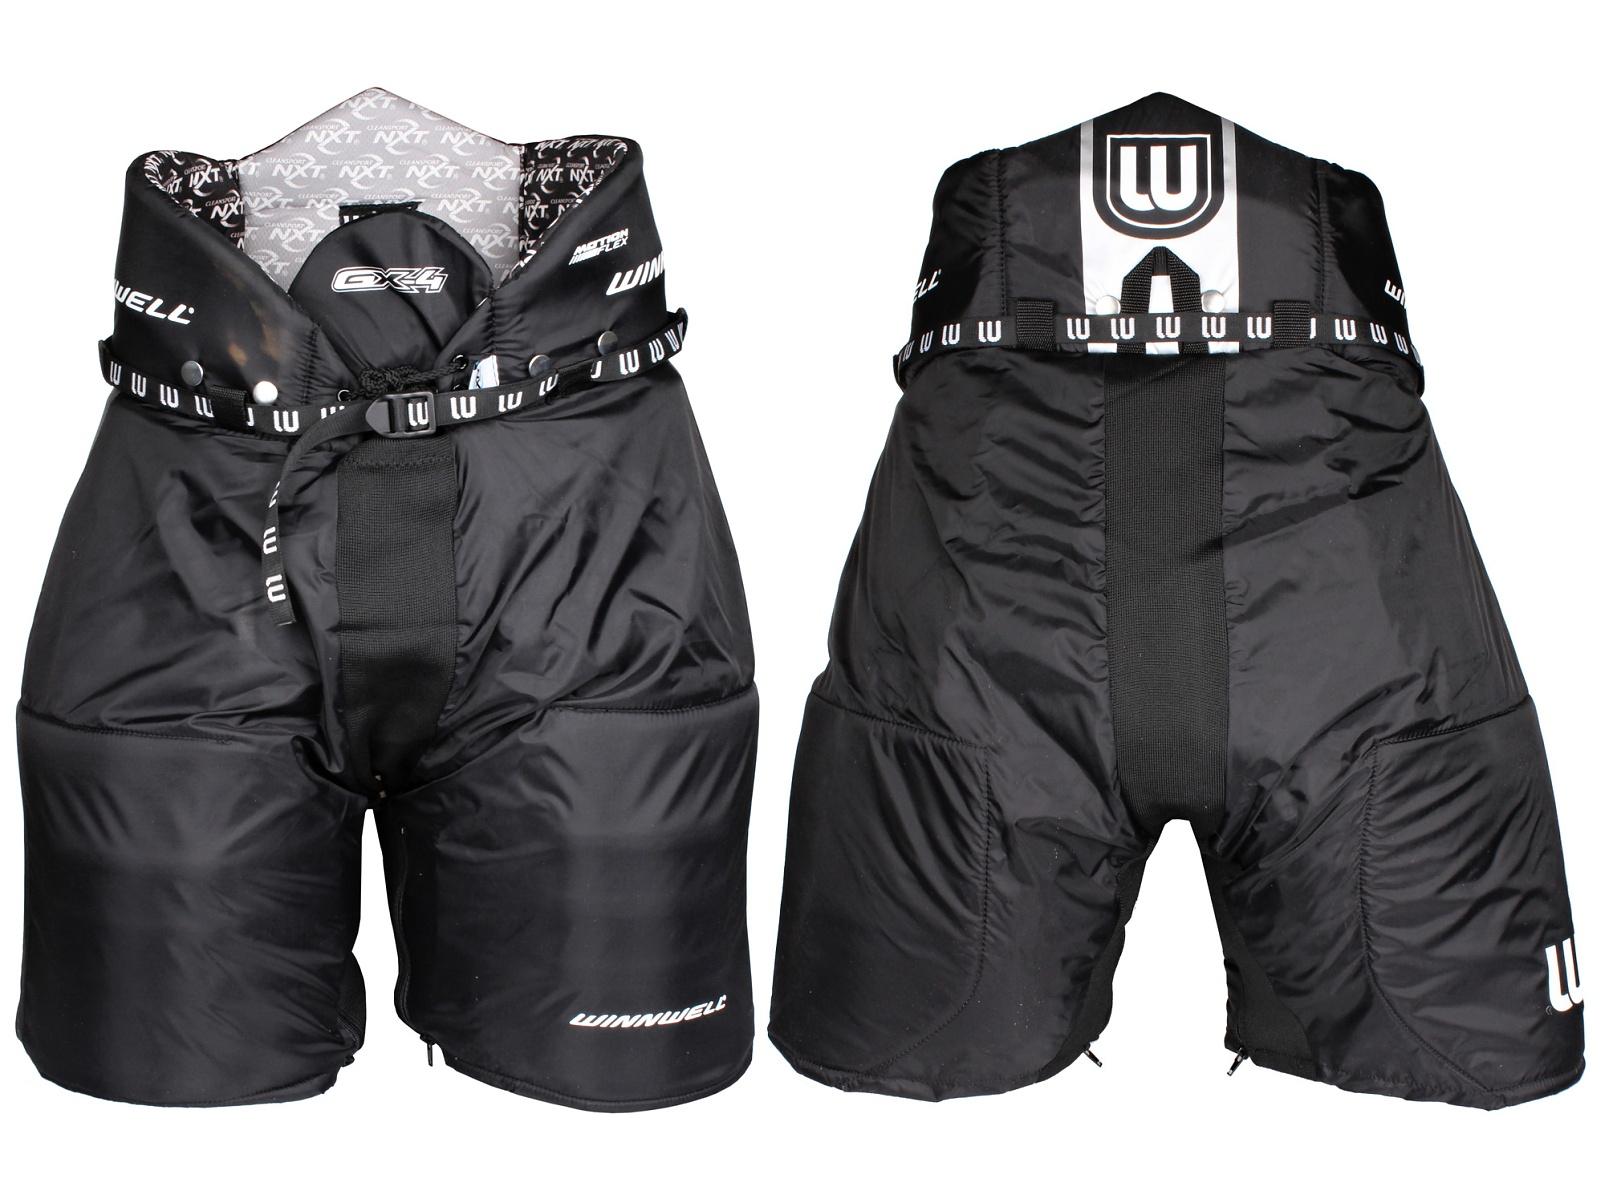 Kalhoty hráčské WINNWELL GX-4 senior černé - vel. XL